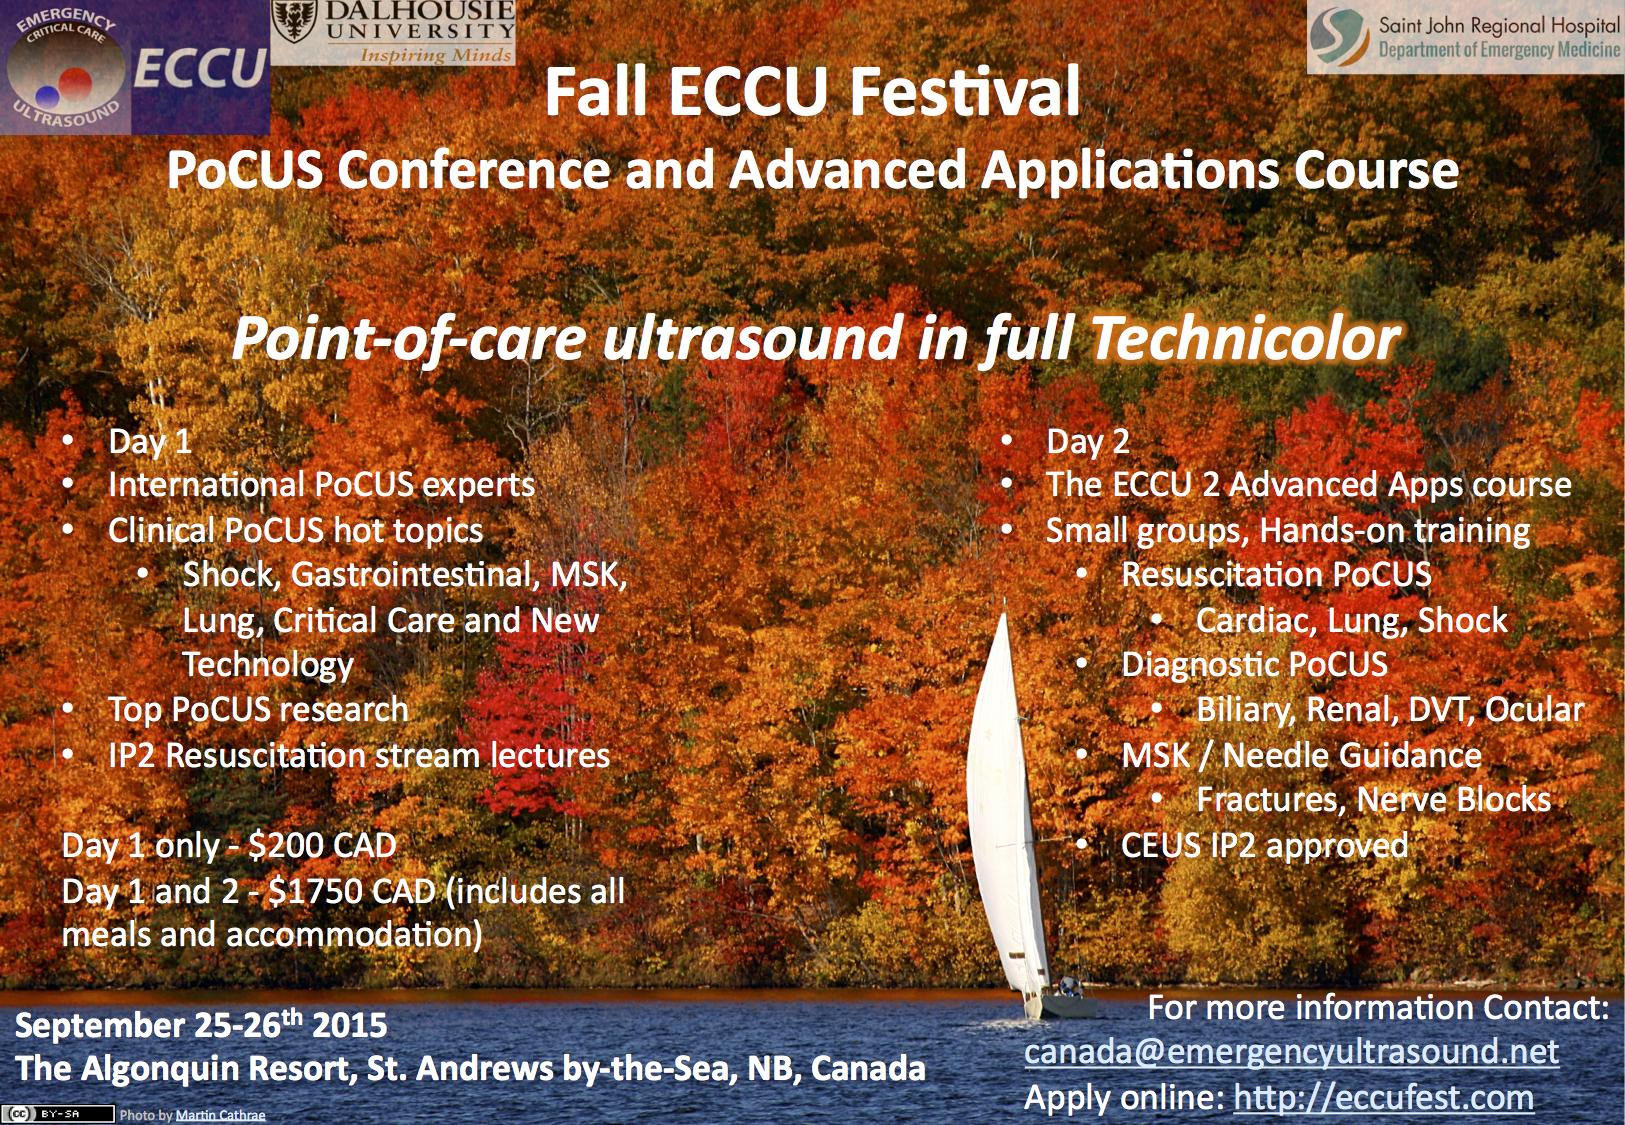 Combined FECCU | Department of Emergency Medicine | Saint John